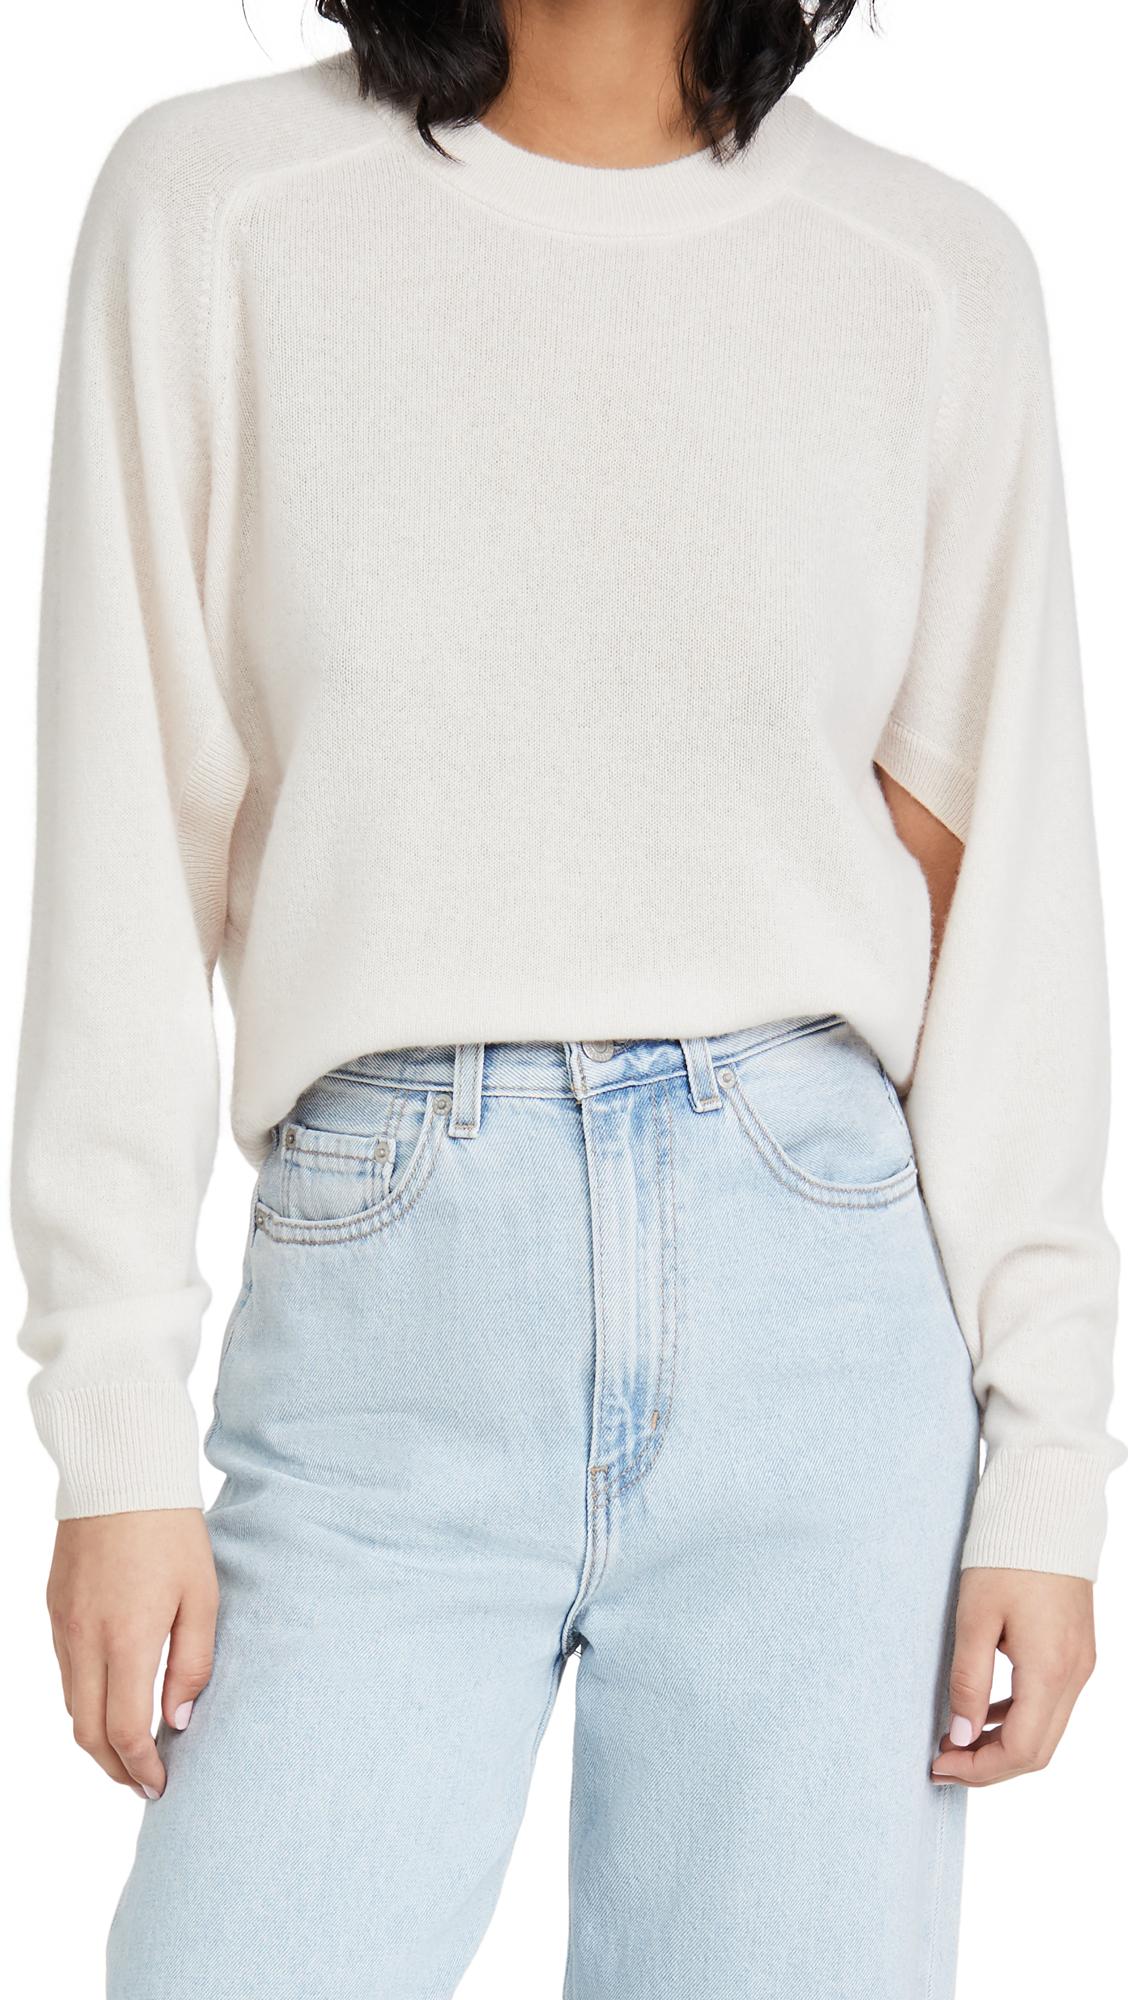 Tibi Featherweight Cashmere Sweater